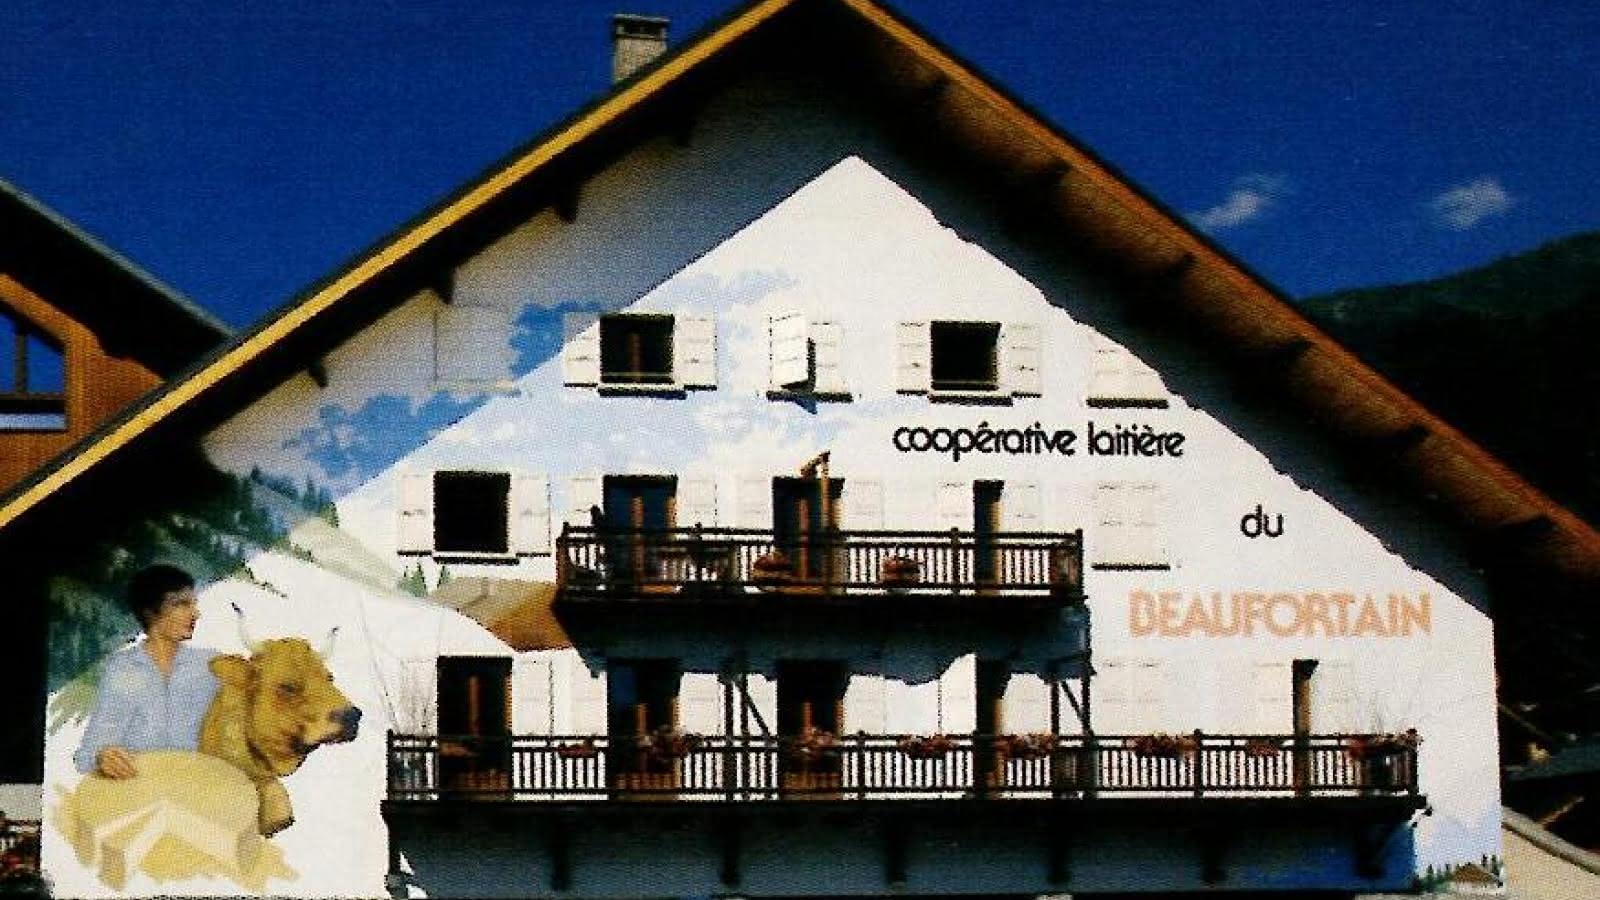 Cooperative_laitiere_beaufortain